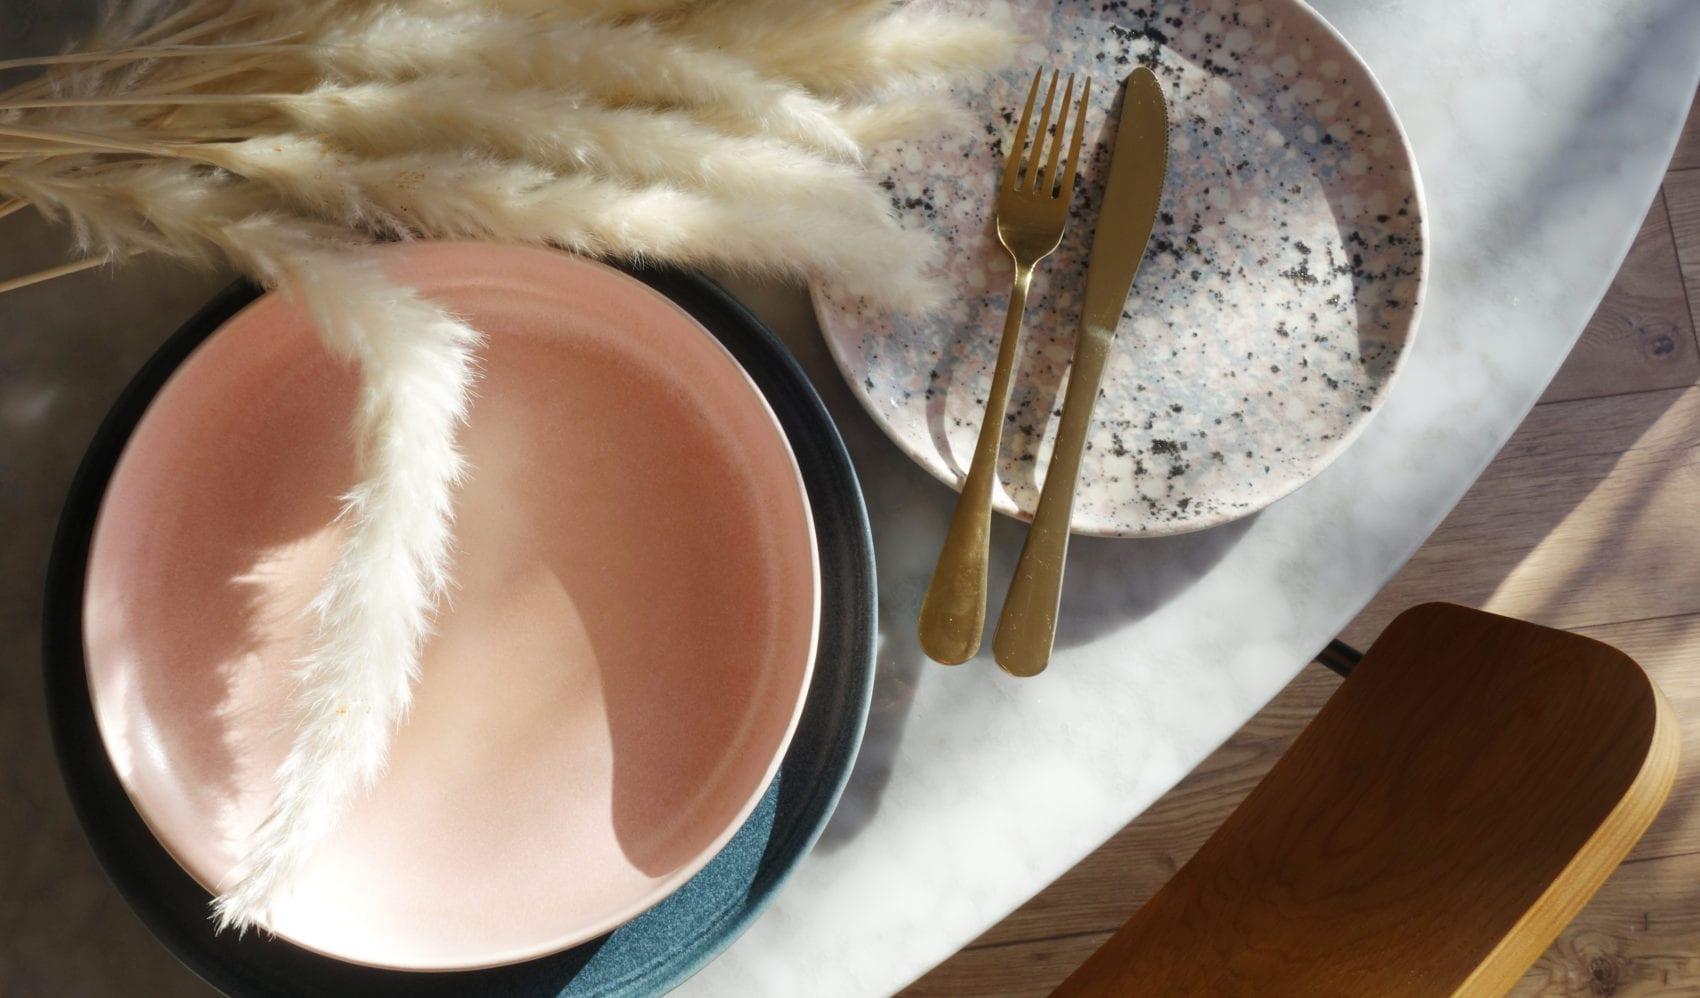 tableware crockery plates cutlery